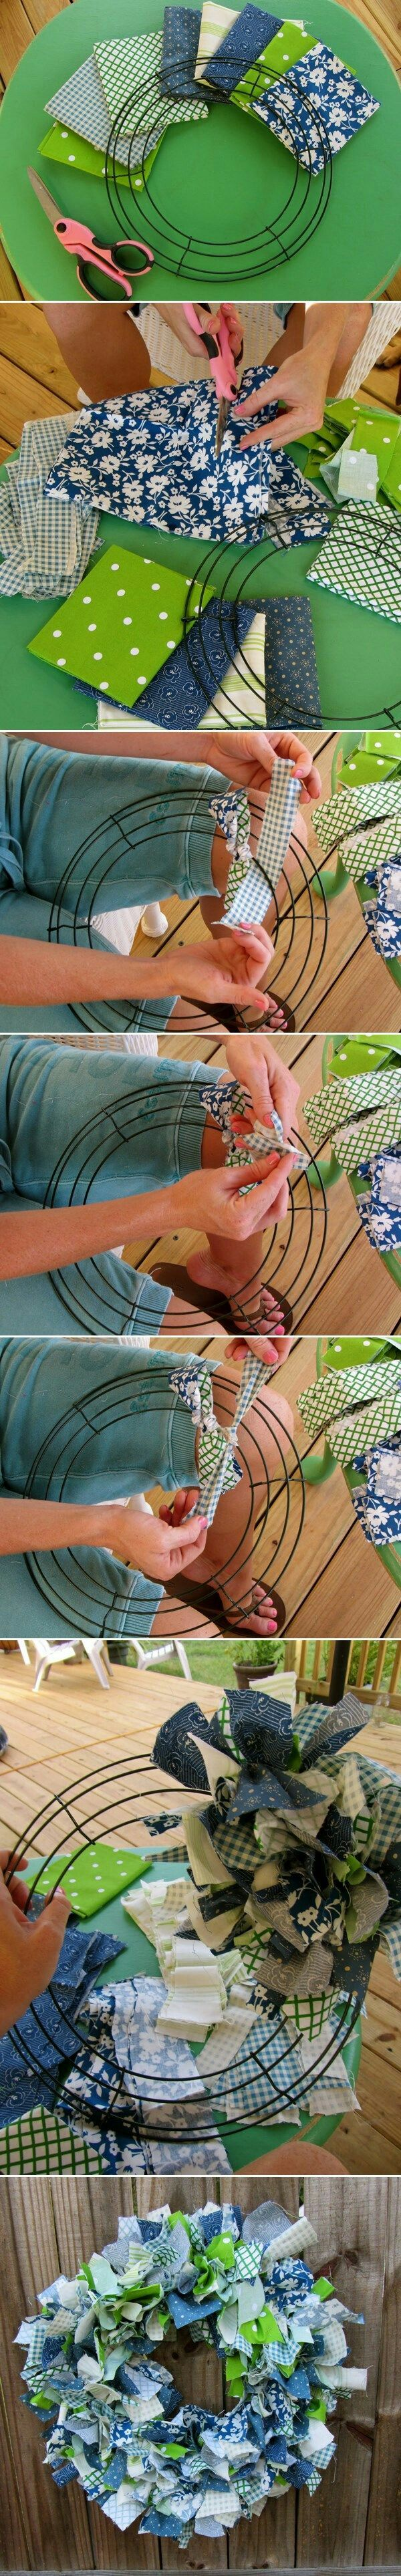 Easy wreath tutorials and best wreath making ideas.  #Wreaths #Tutorials #WreathDIYInspiration #wreathideas #DIYwreathideas #wreathtutorial #diywreath #wreathdiy #howtodecorateawreath #easywreath #howtomakeawreath #doorwreath #makingwreath #decomeshwreath #fabricwreath #doordecorations #homedecorideas #howto #diy #diyprojects #MaryTarditochannel #DIYHobbyandLifestyle #craftsideas #homedecoratingideas #diyhomedecor #домашнийдекор #веночки #декор #своимируками #дом #интерьер #diy